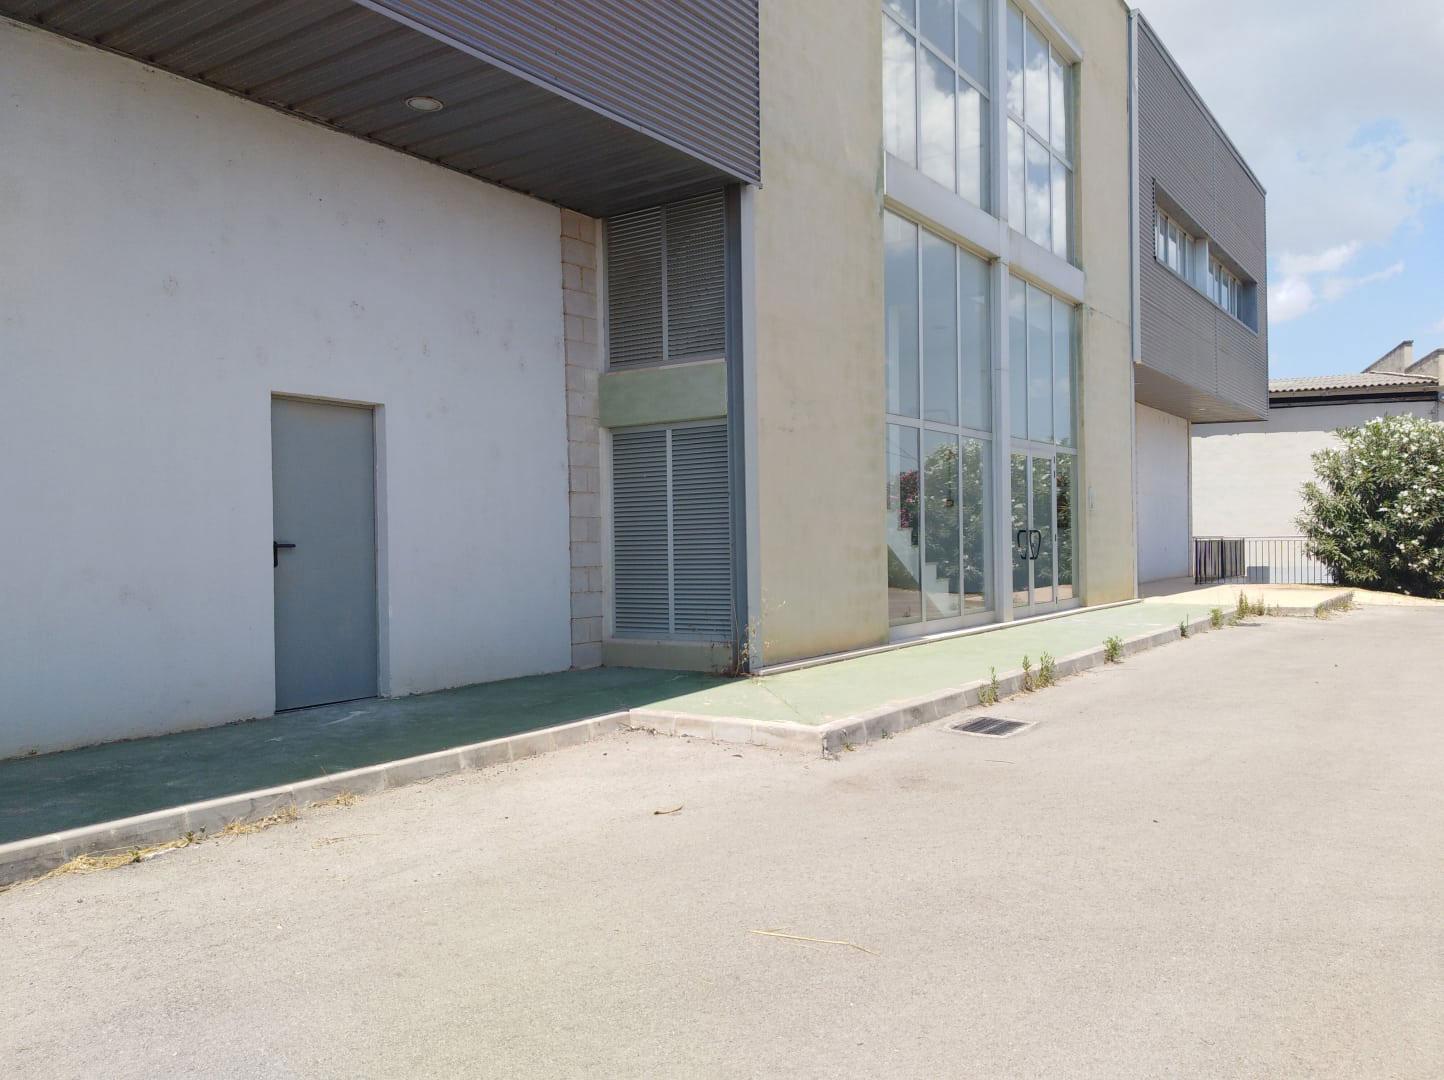 Oficina en venta en Porreres, Baleares, Carretera Campos, 108.885 €, 172 m2